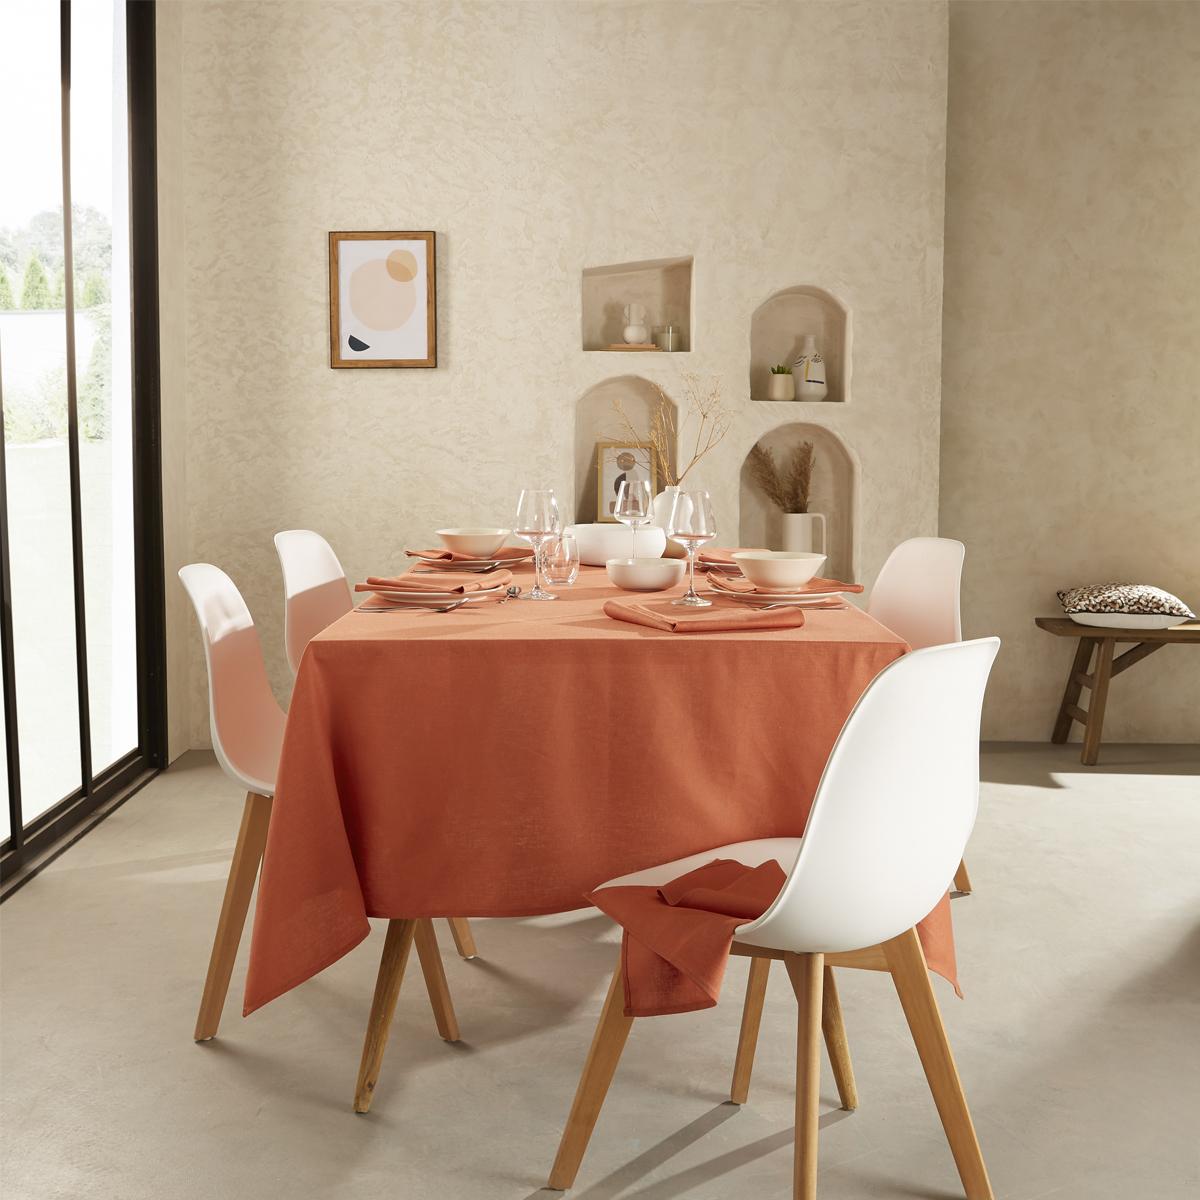 Nappe unie en polylin tangerine 180 x 180